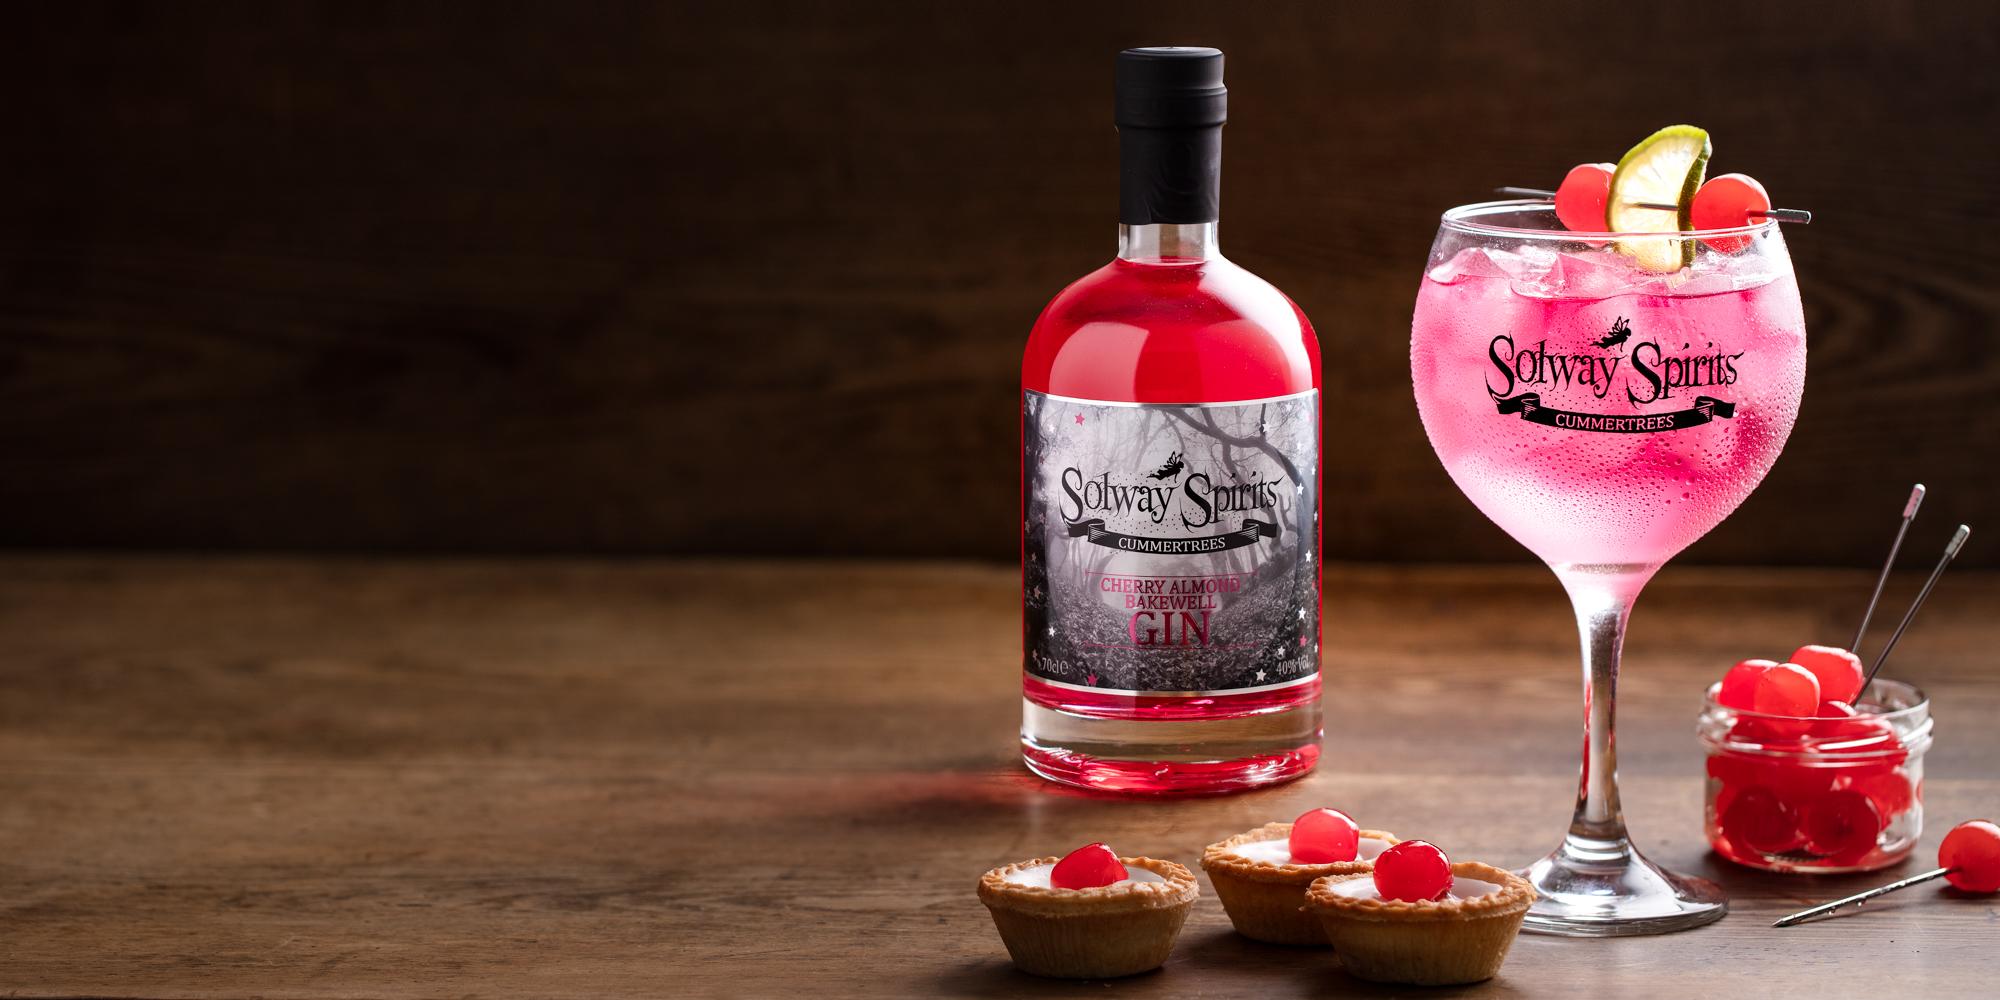 Cherry Almond Bakewell Gin